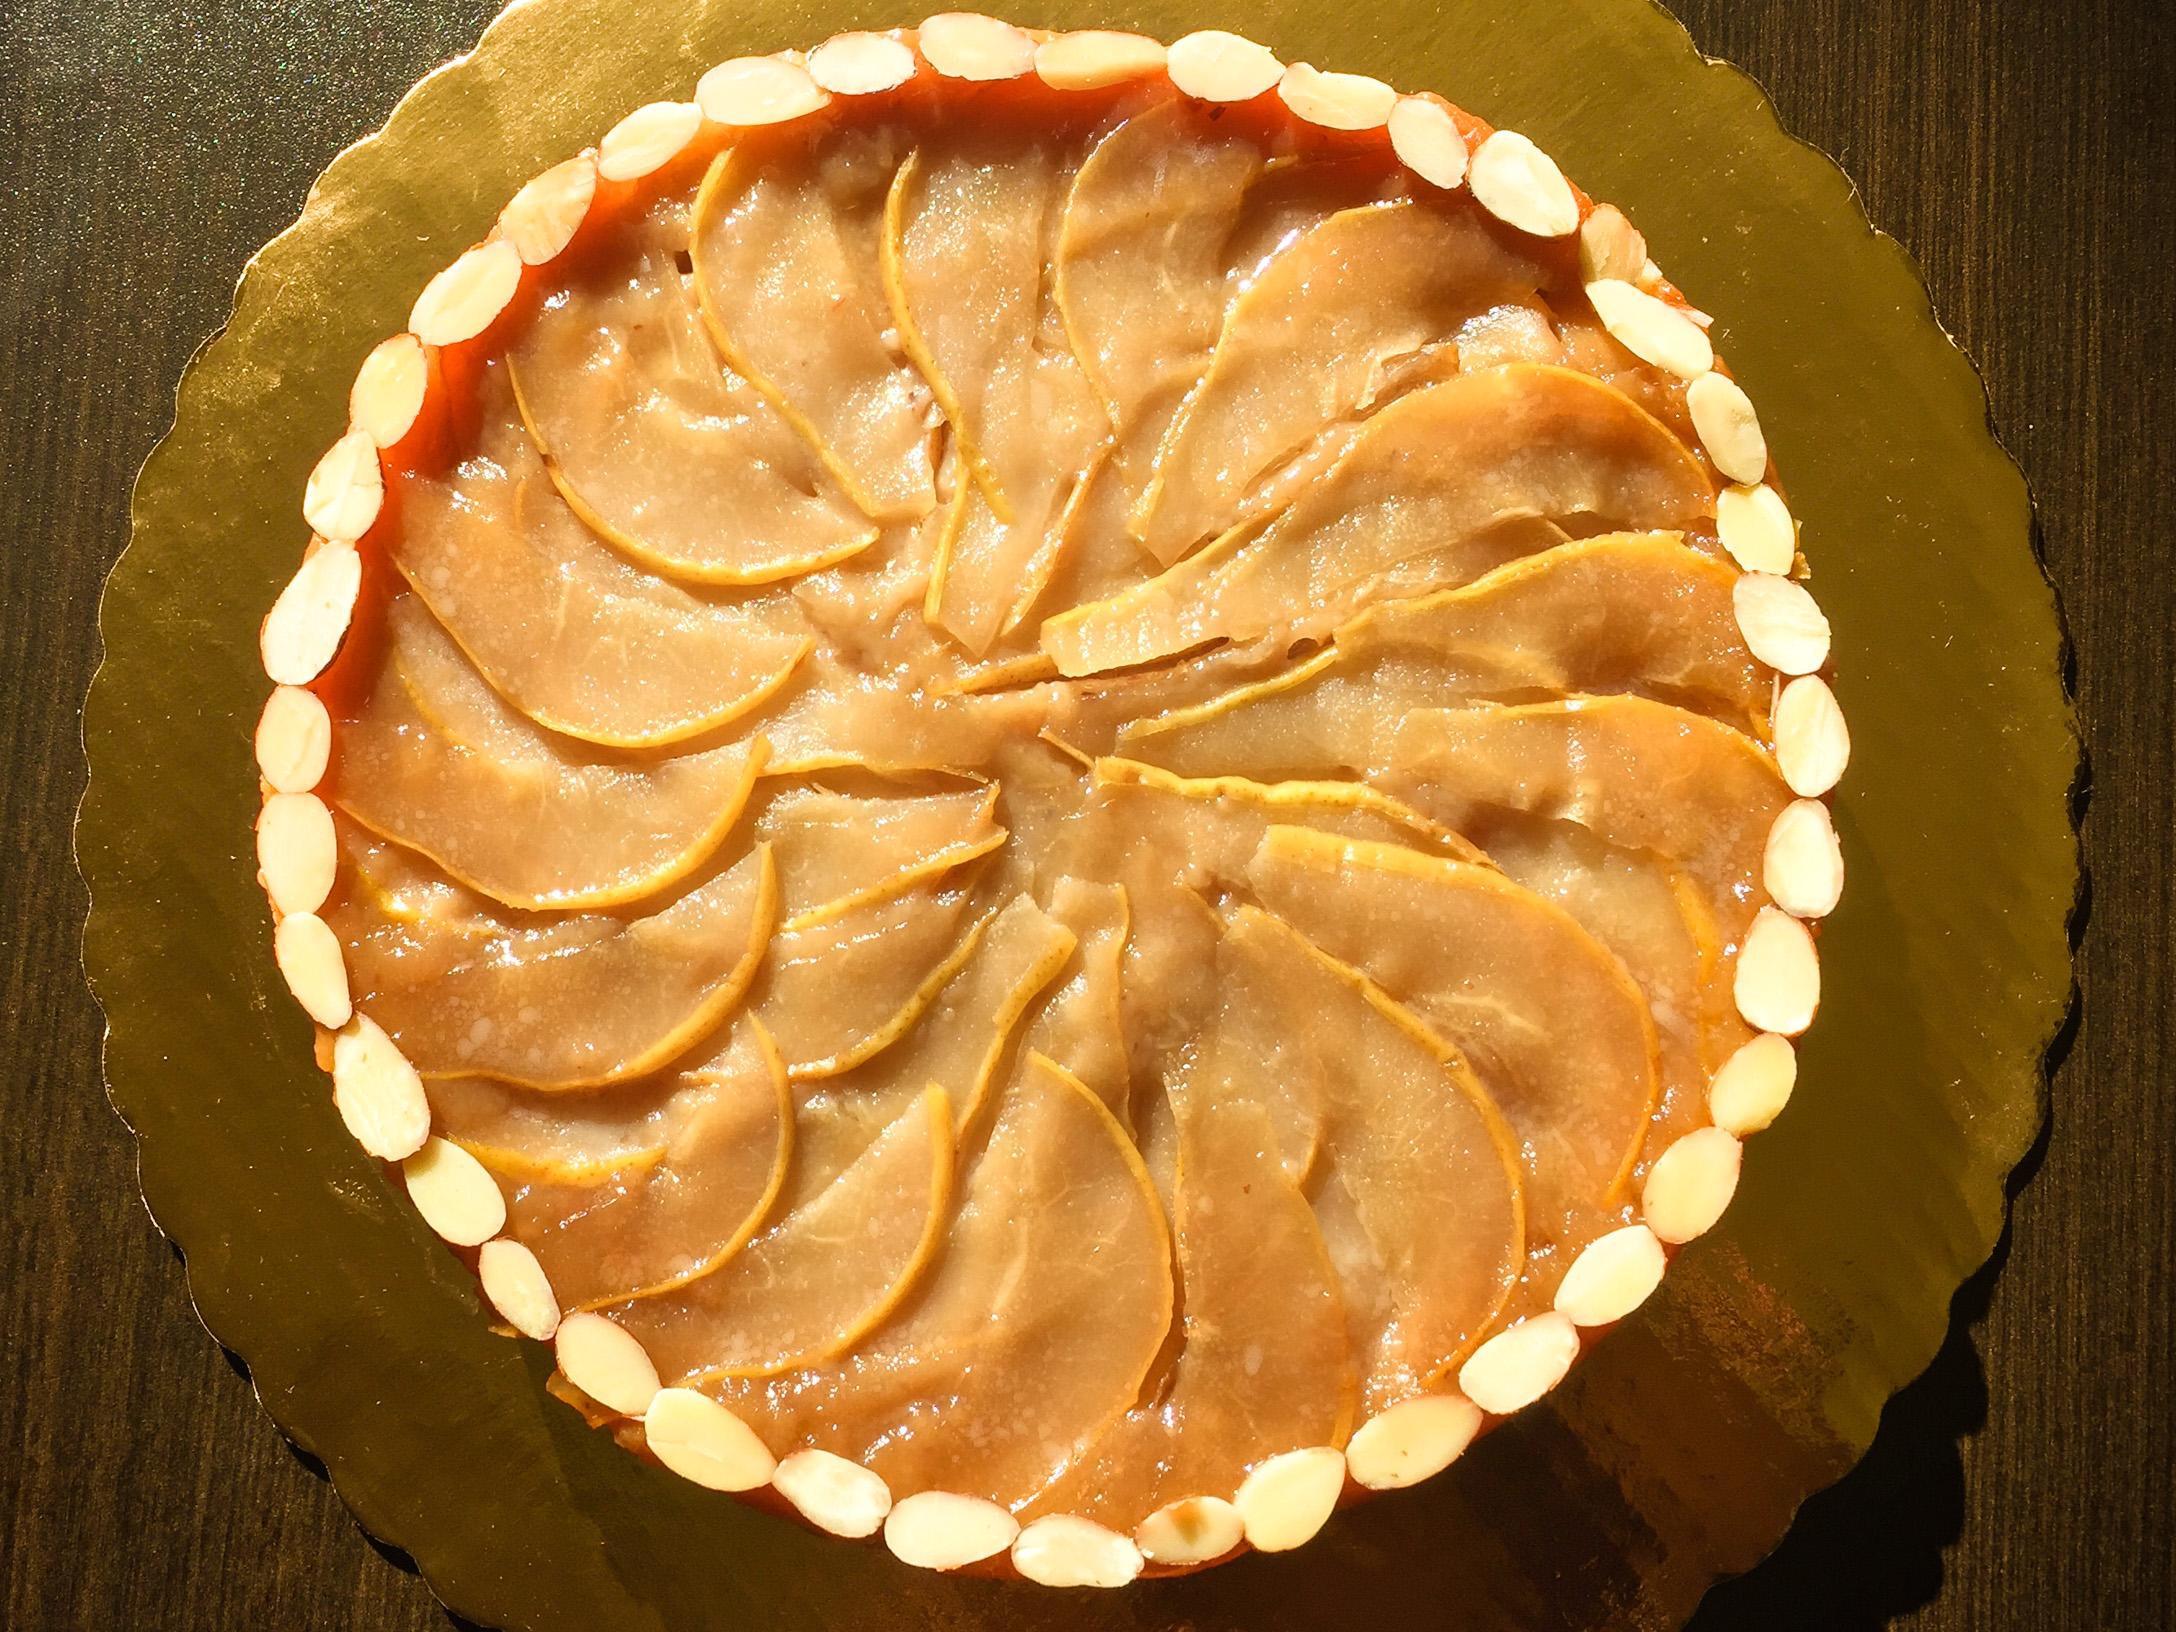 upside-down Pear-almond cake